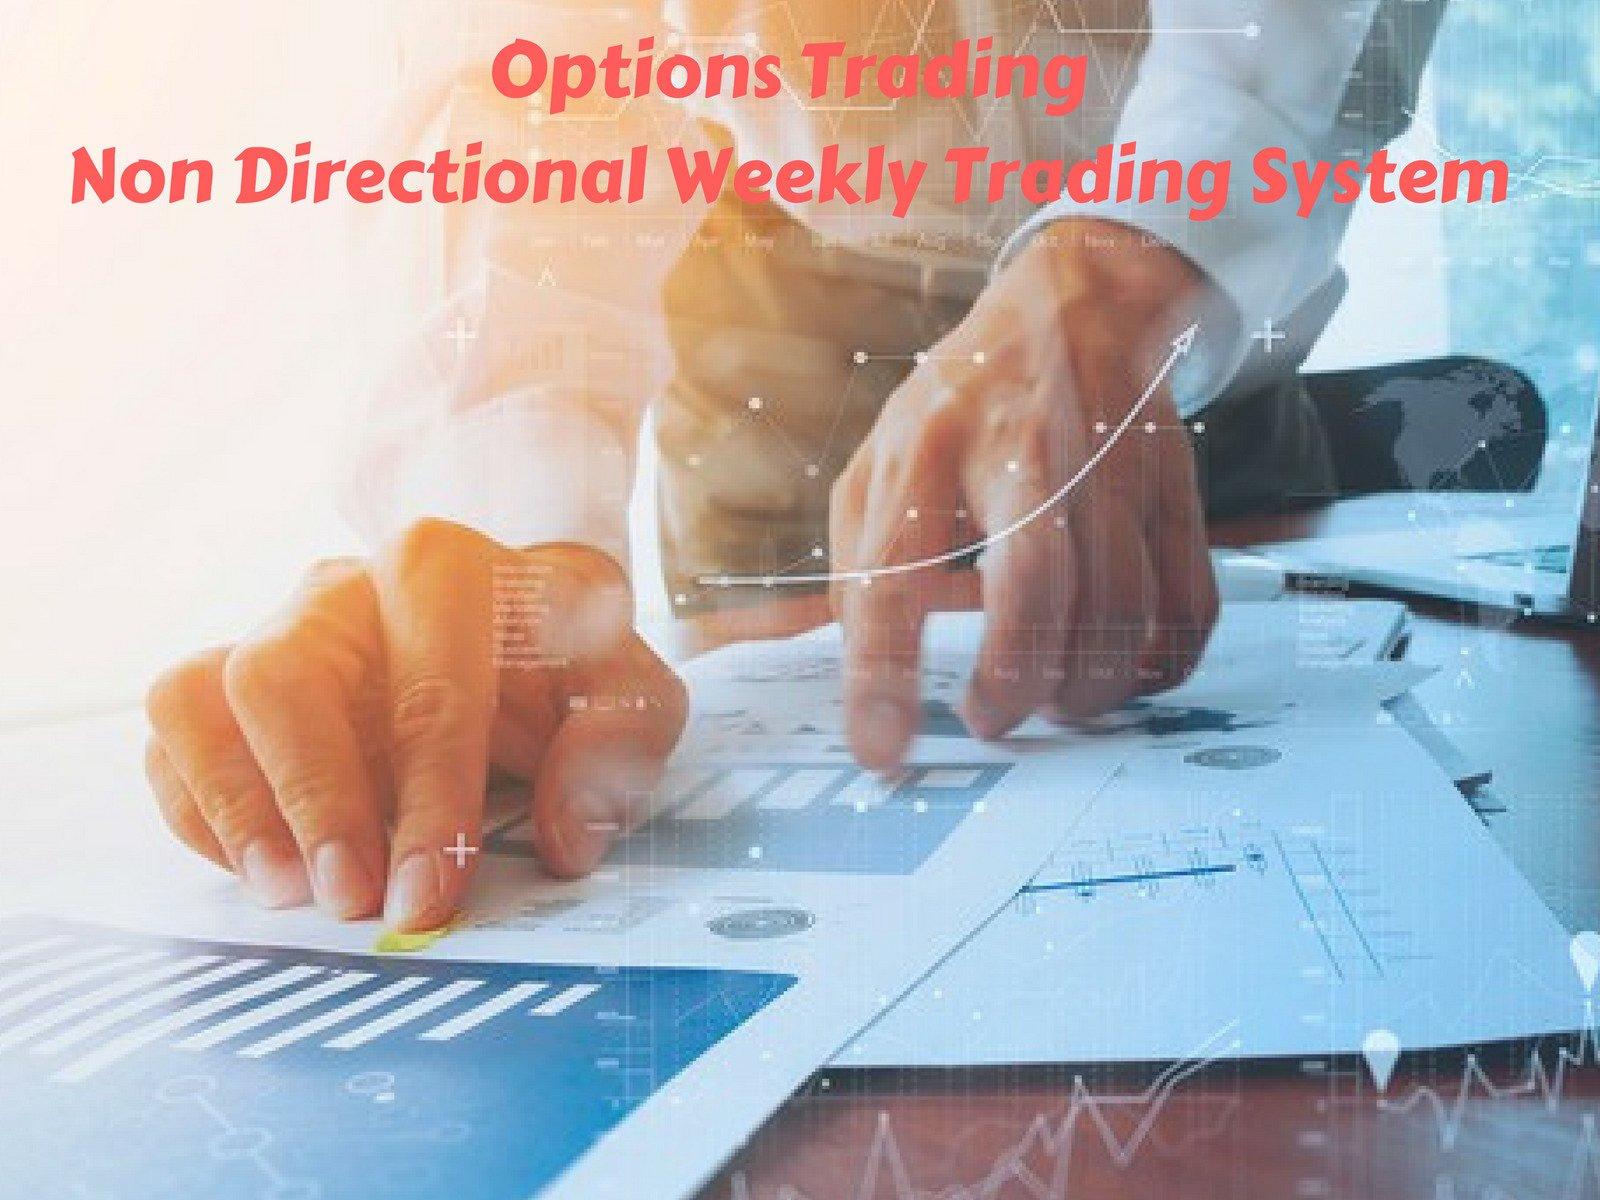 Options Trading - Season 1